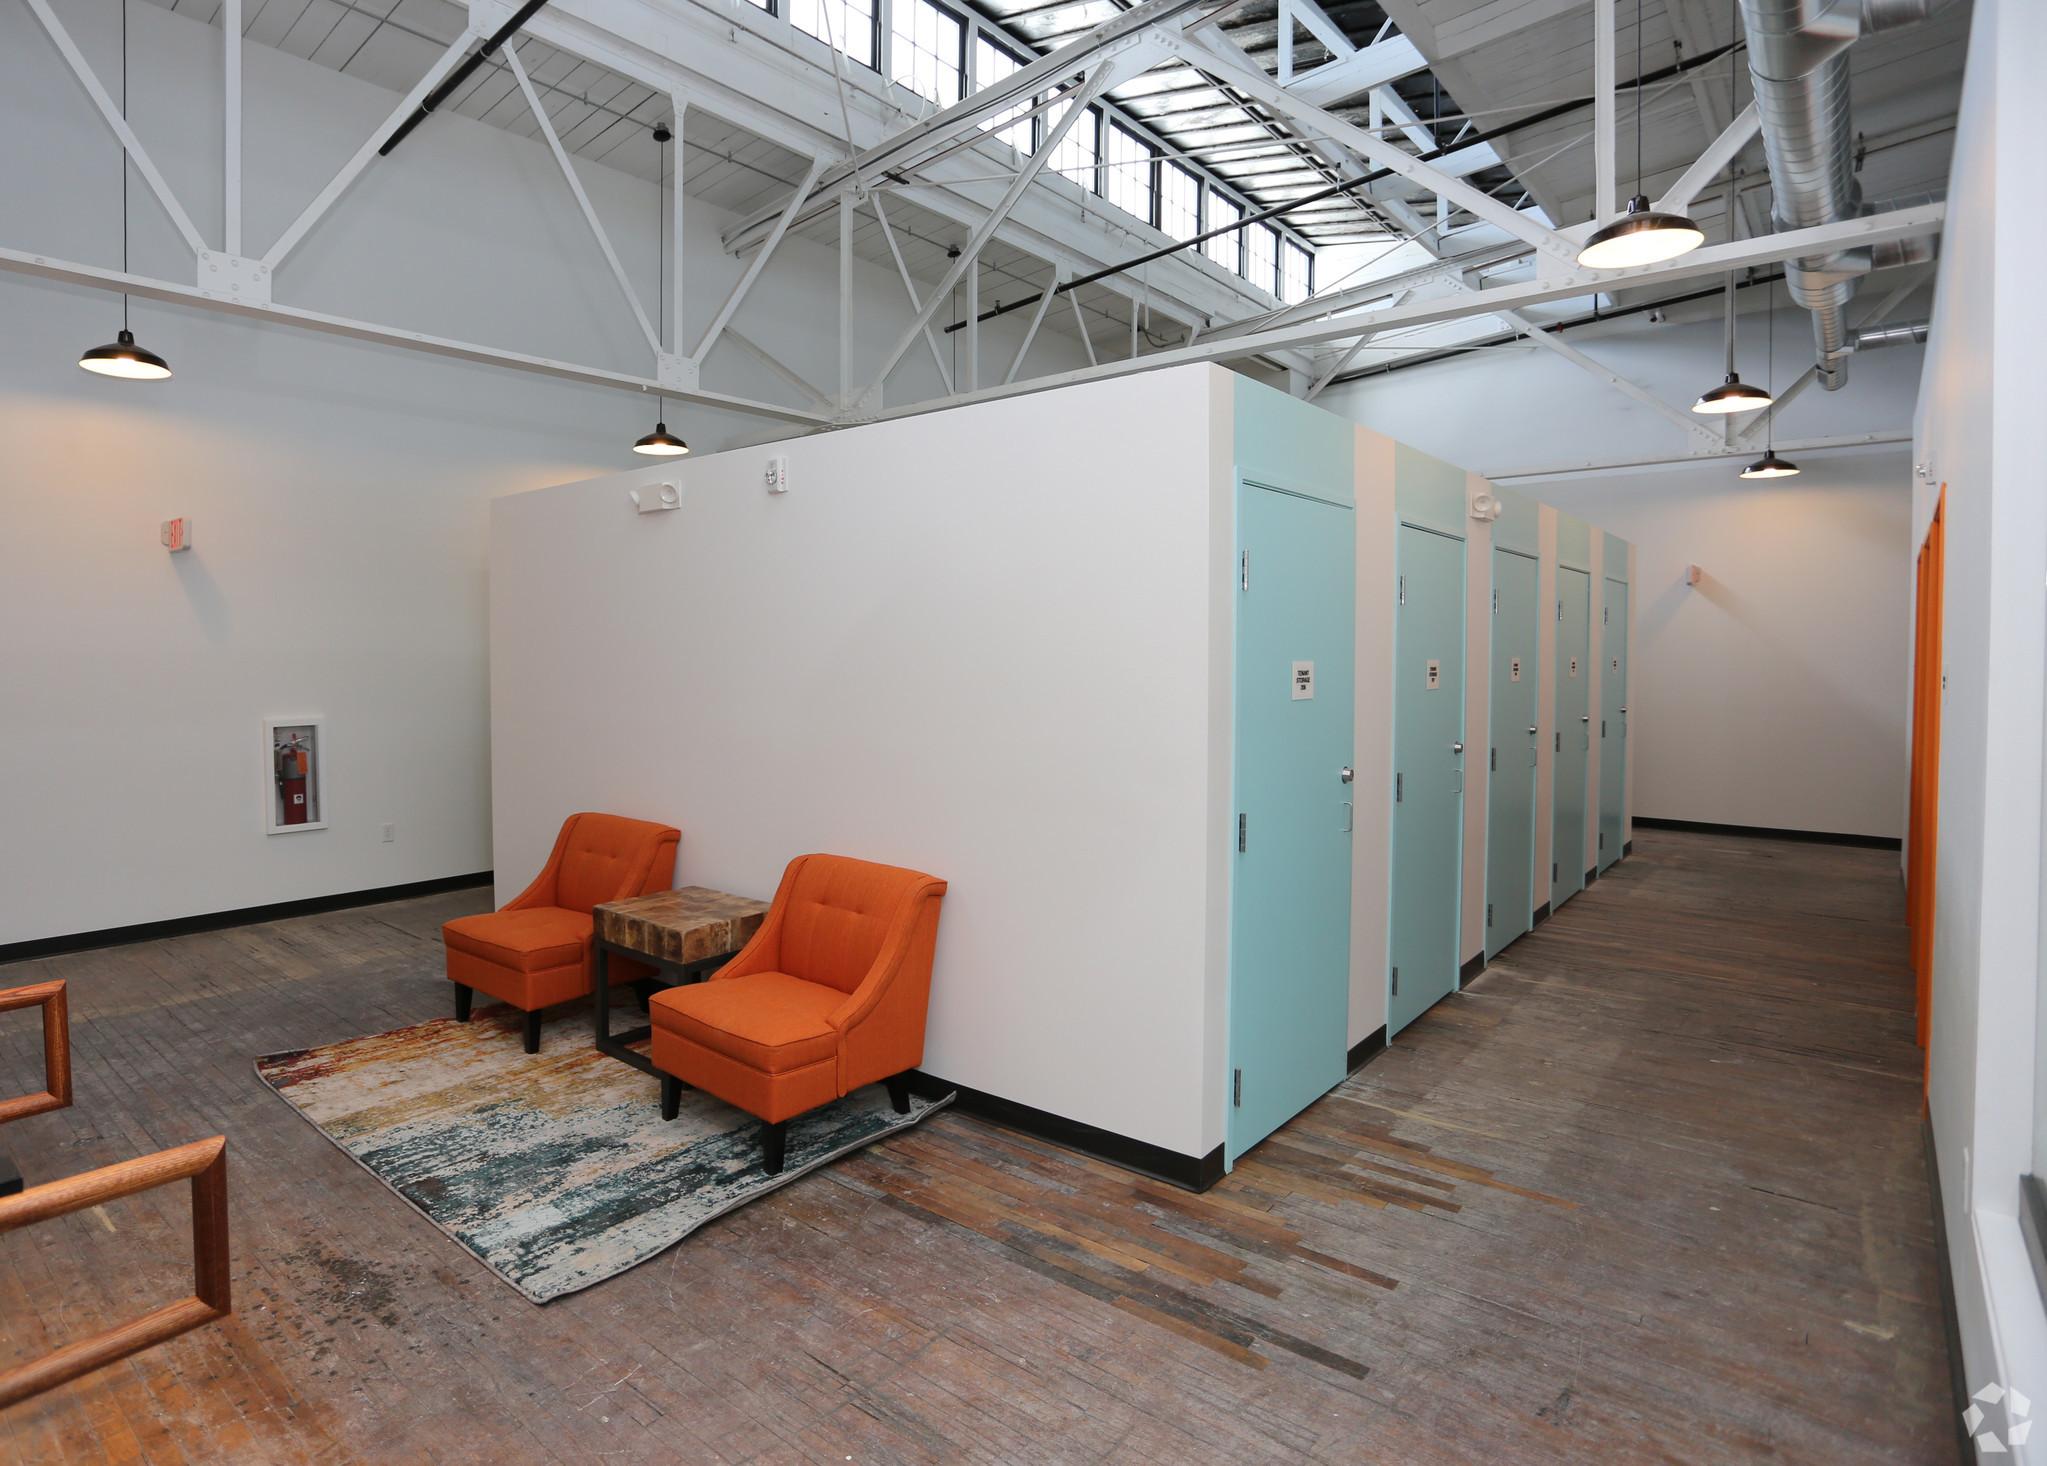 atrium-lofts-wausau-wi-community-room (1).jpg